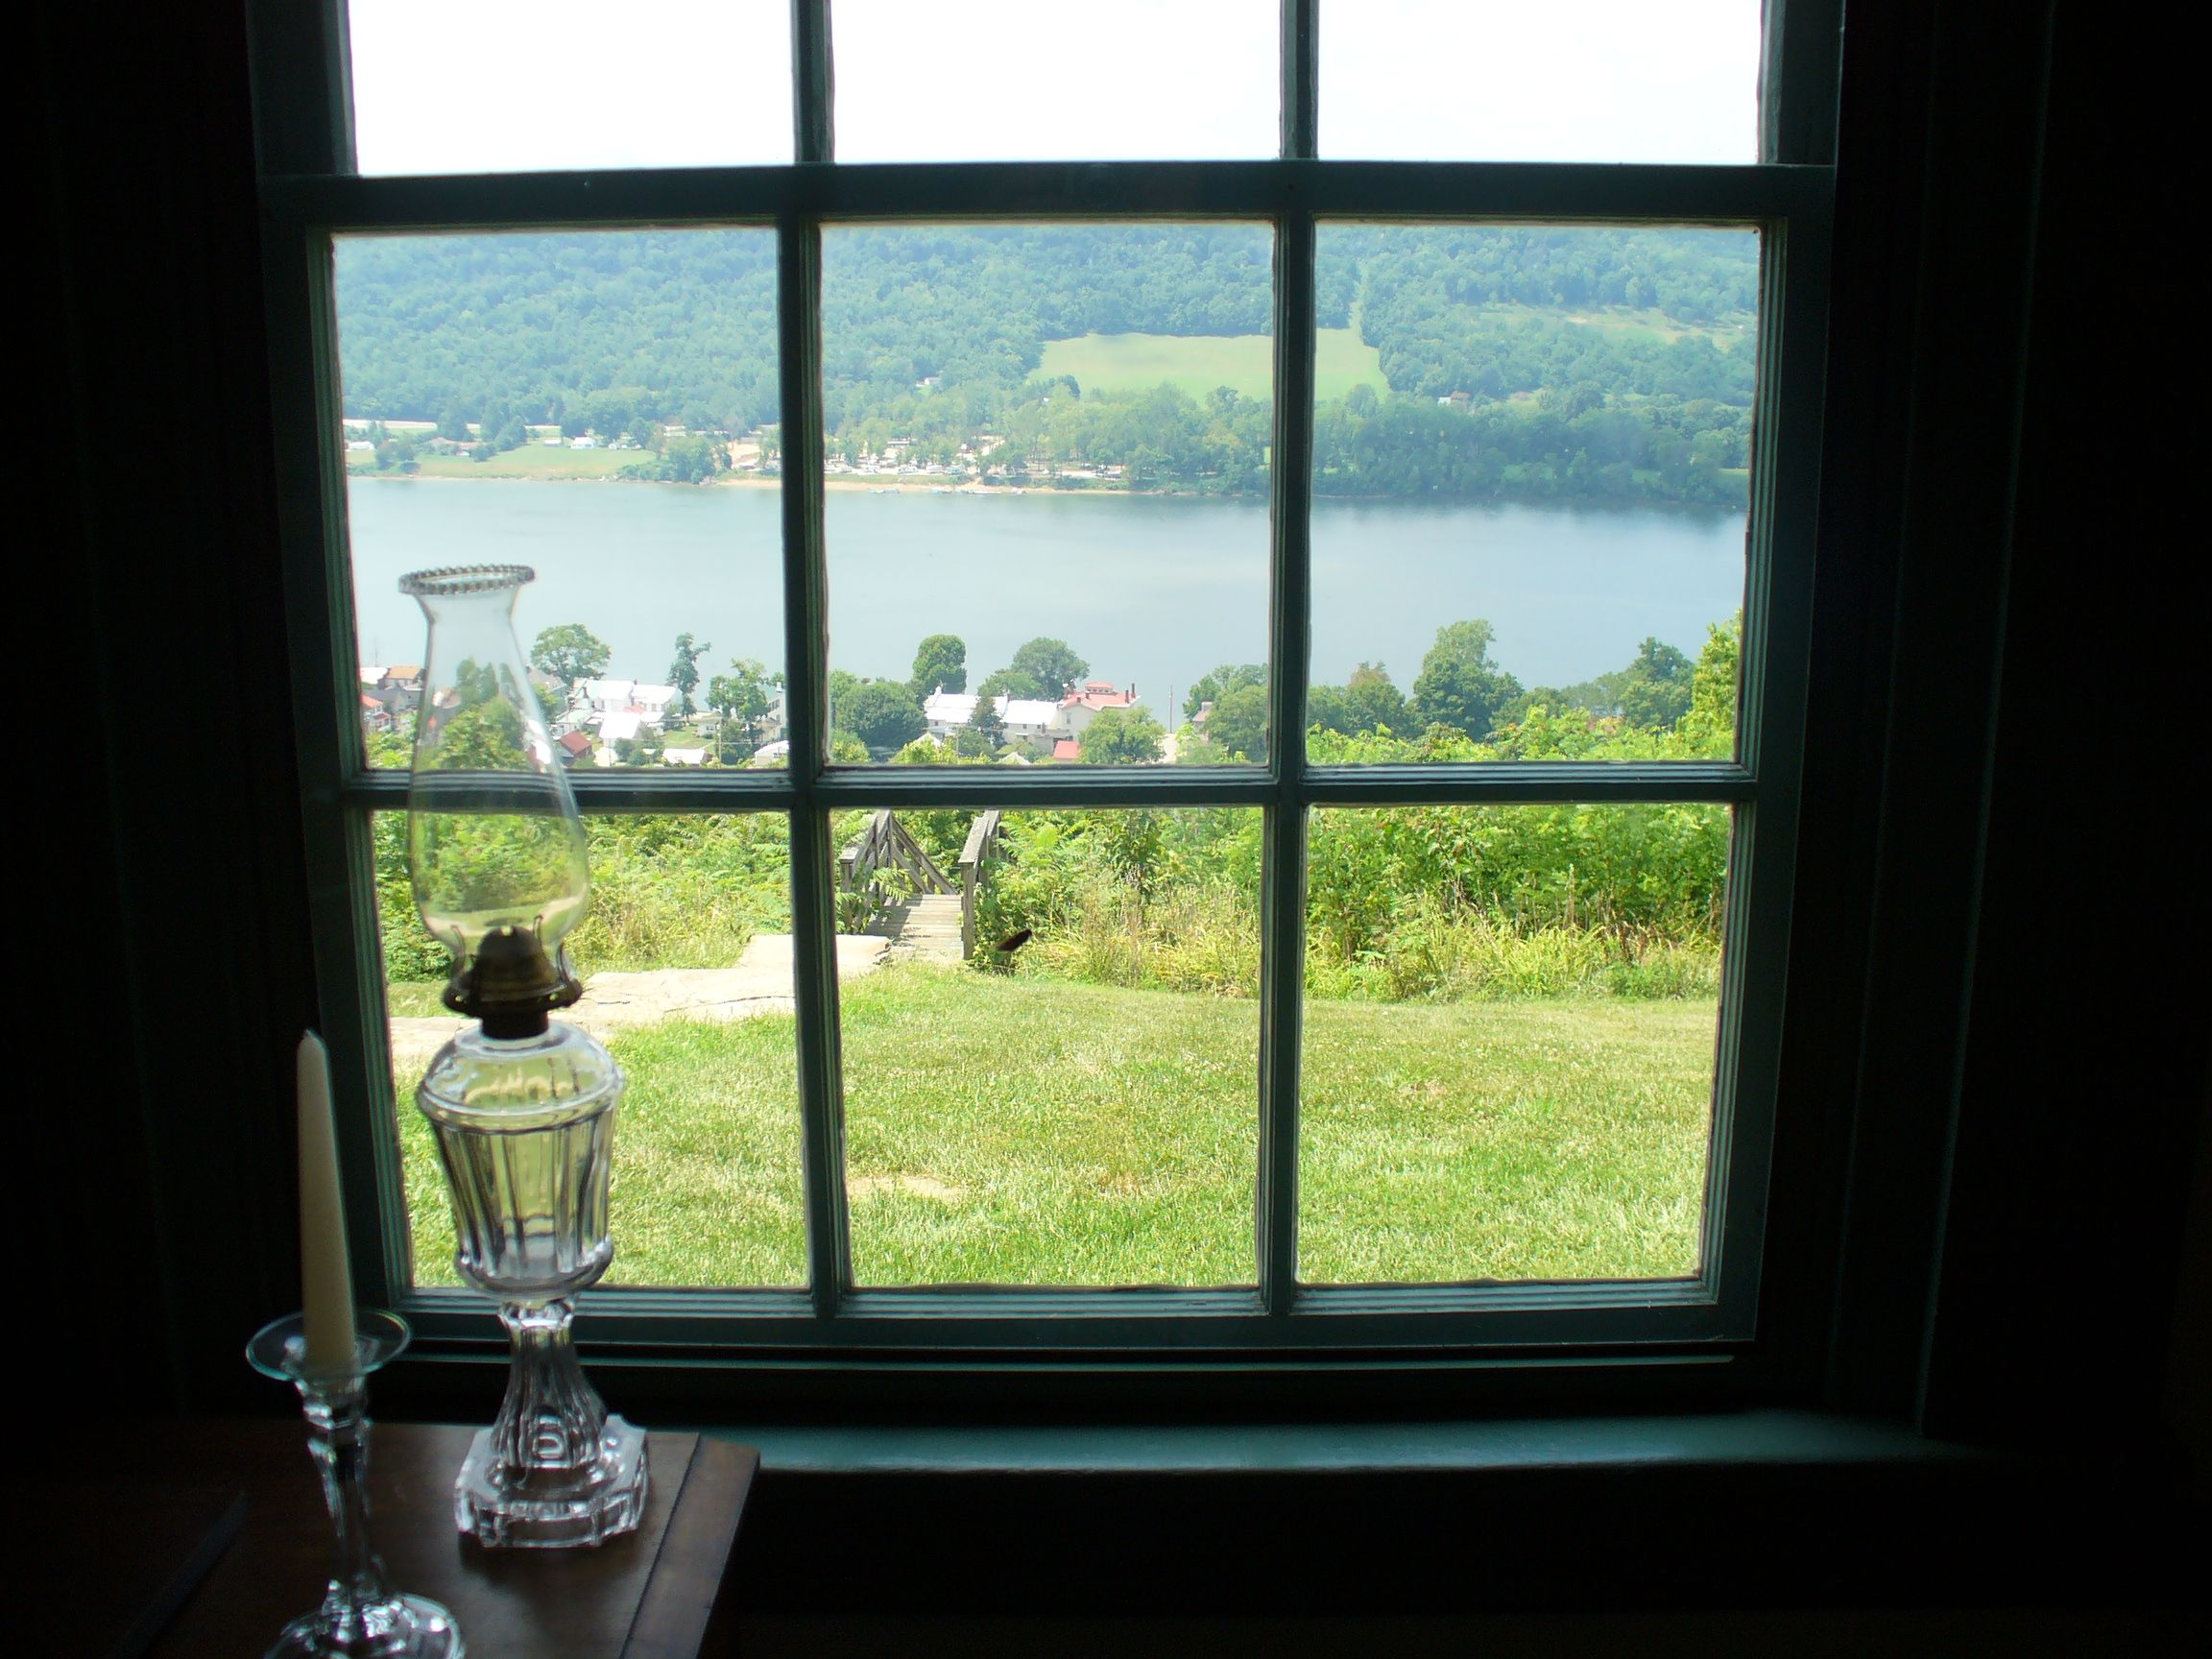 House window images - Window Photography Original File 2 304 1 728 Pixels File Size 1 22